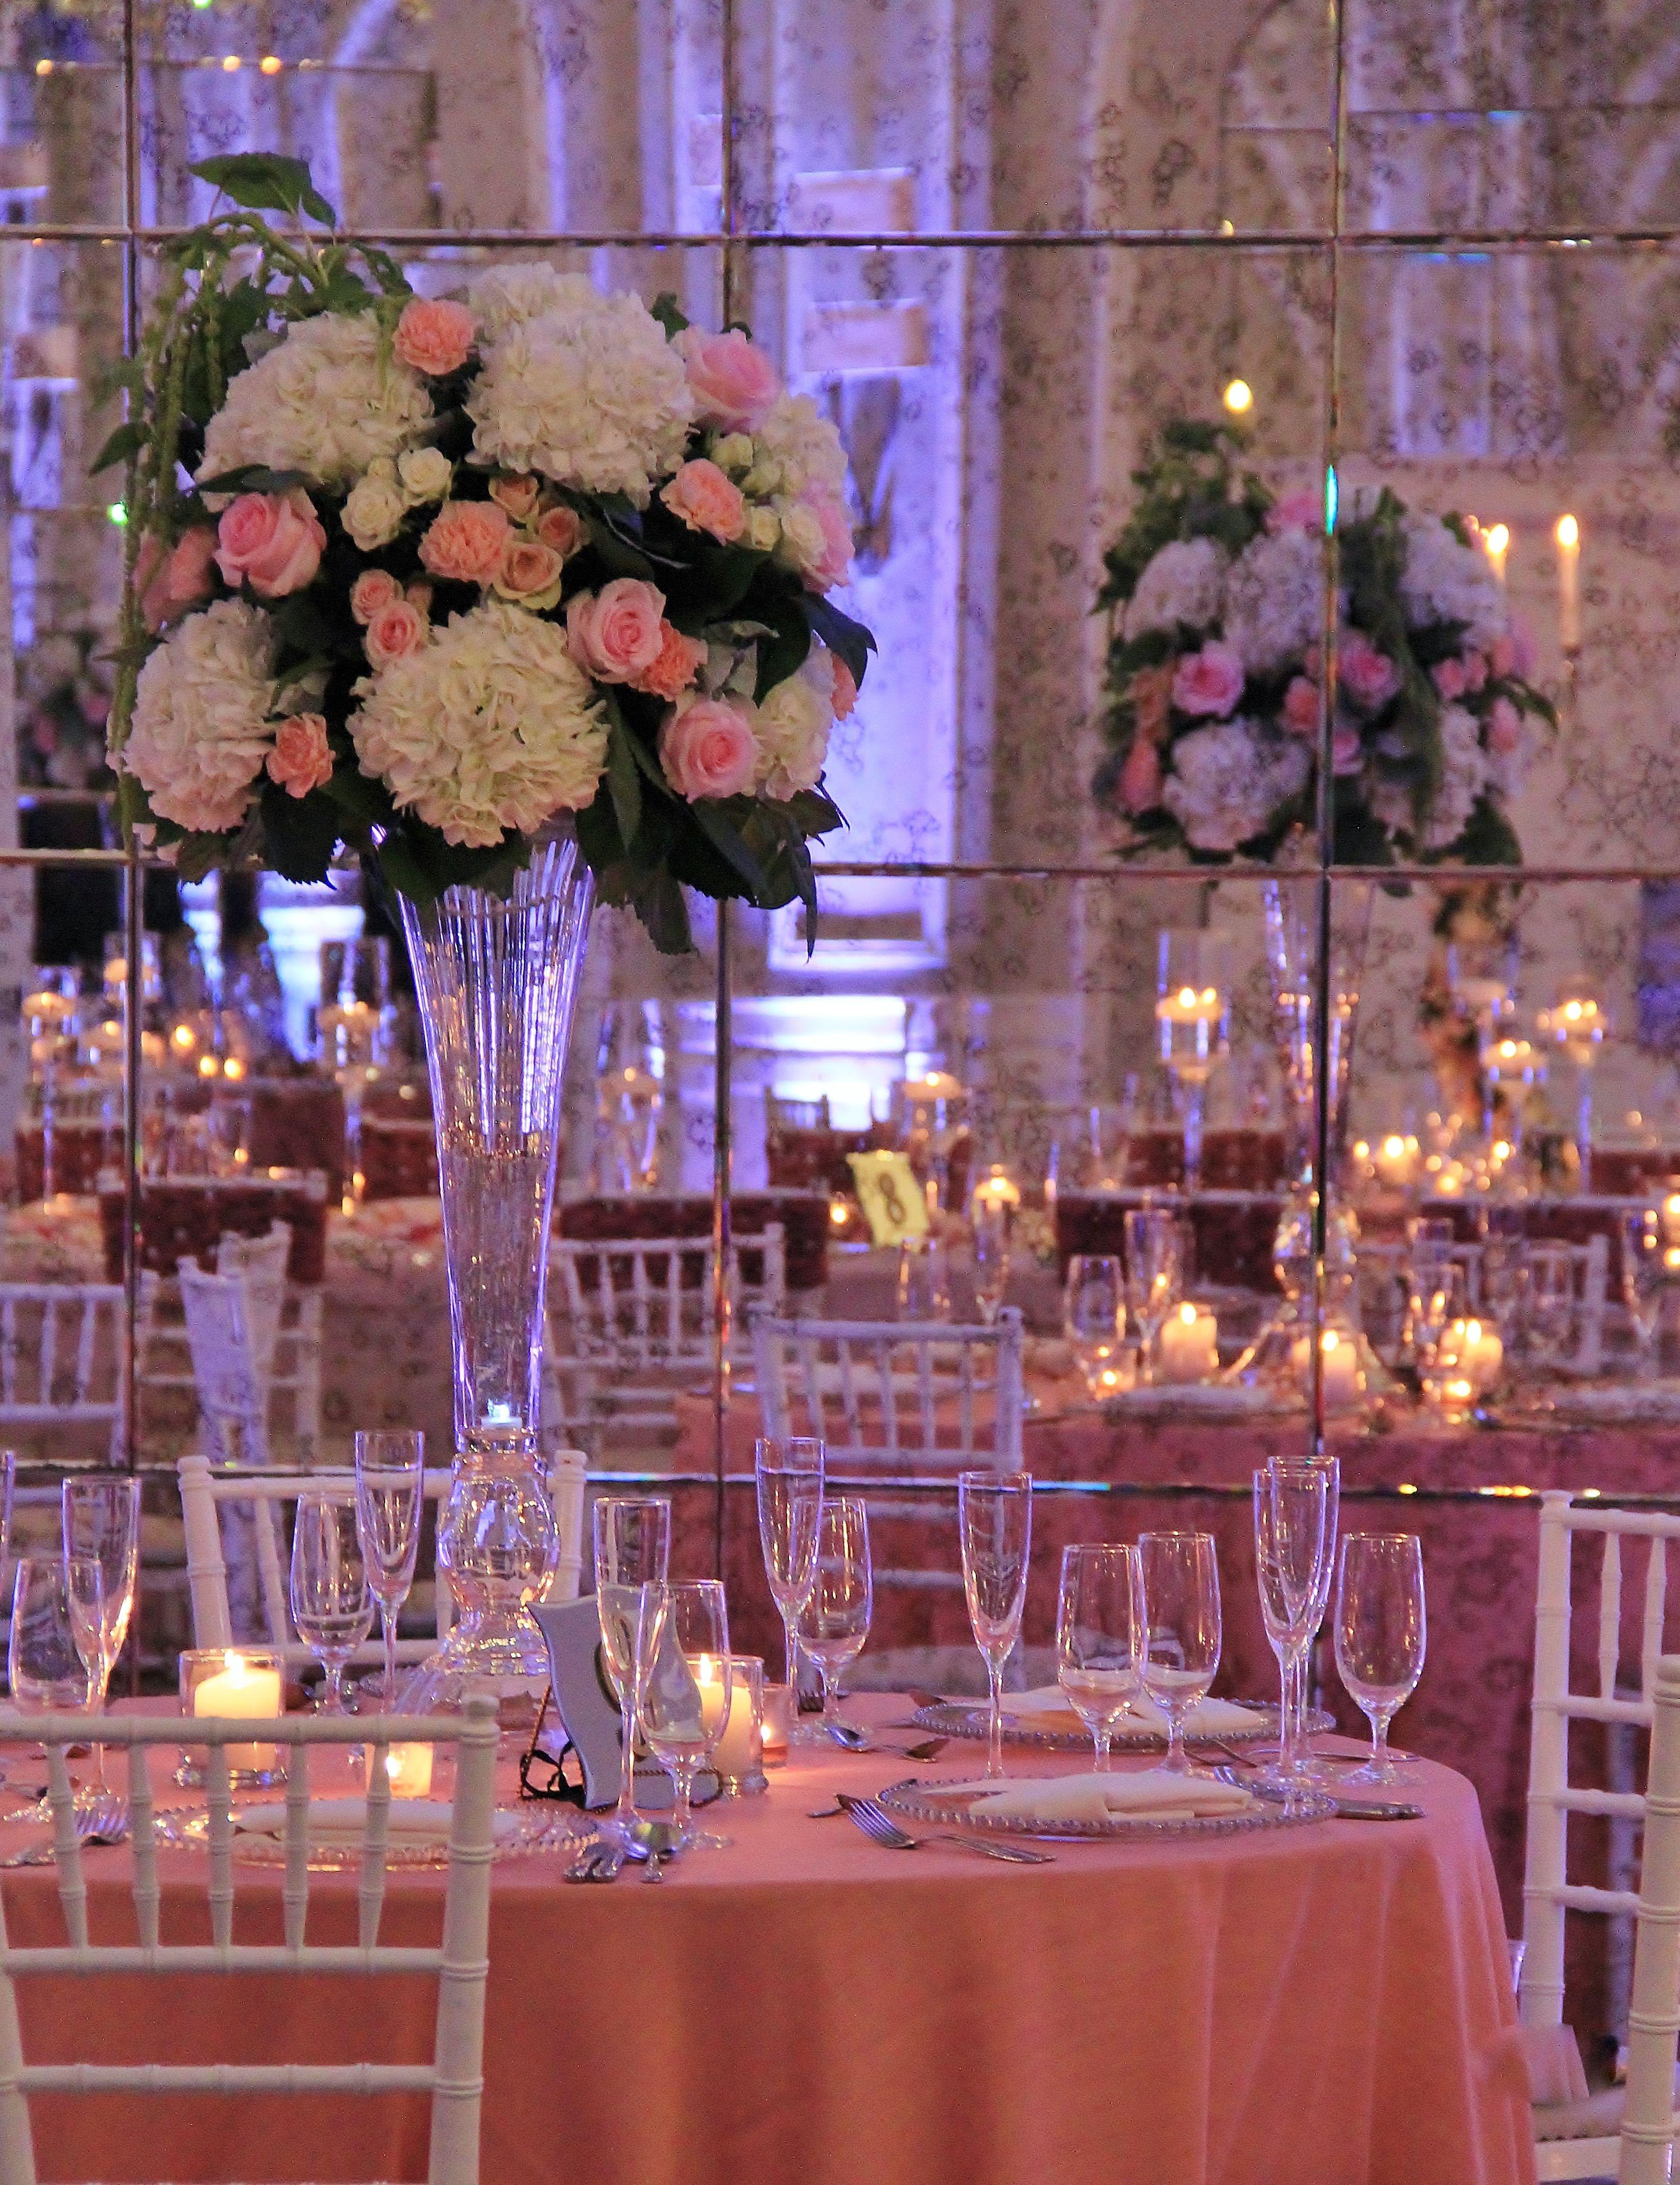 bulk bud vases wedding of 15 beautiful rose gold vases bulk bogekompresorturkiye com regarding wedding floral centerpieces fresh trumpet vases filled at the crystal ballroom with hydrangeas spray wedding